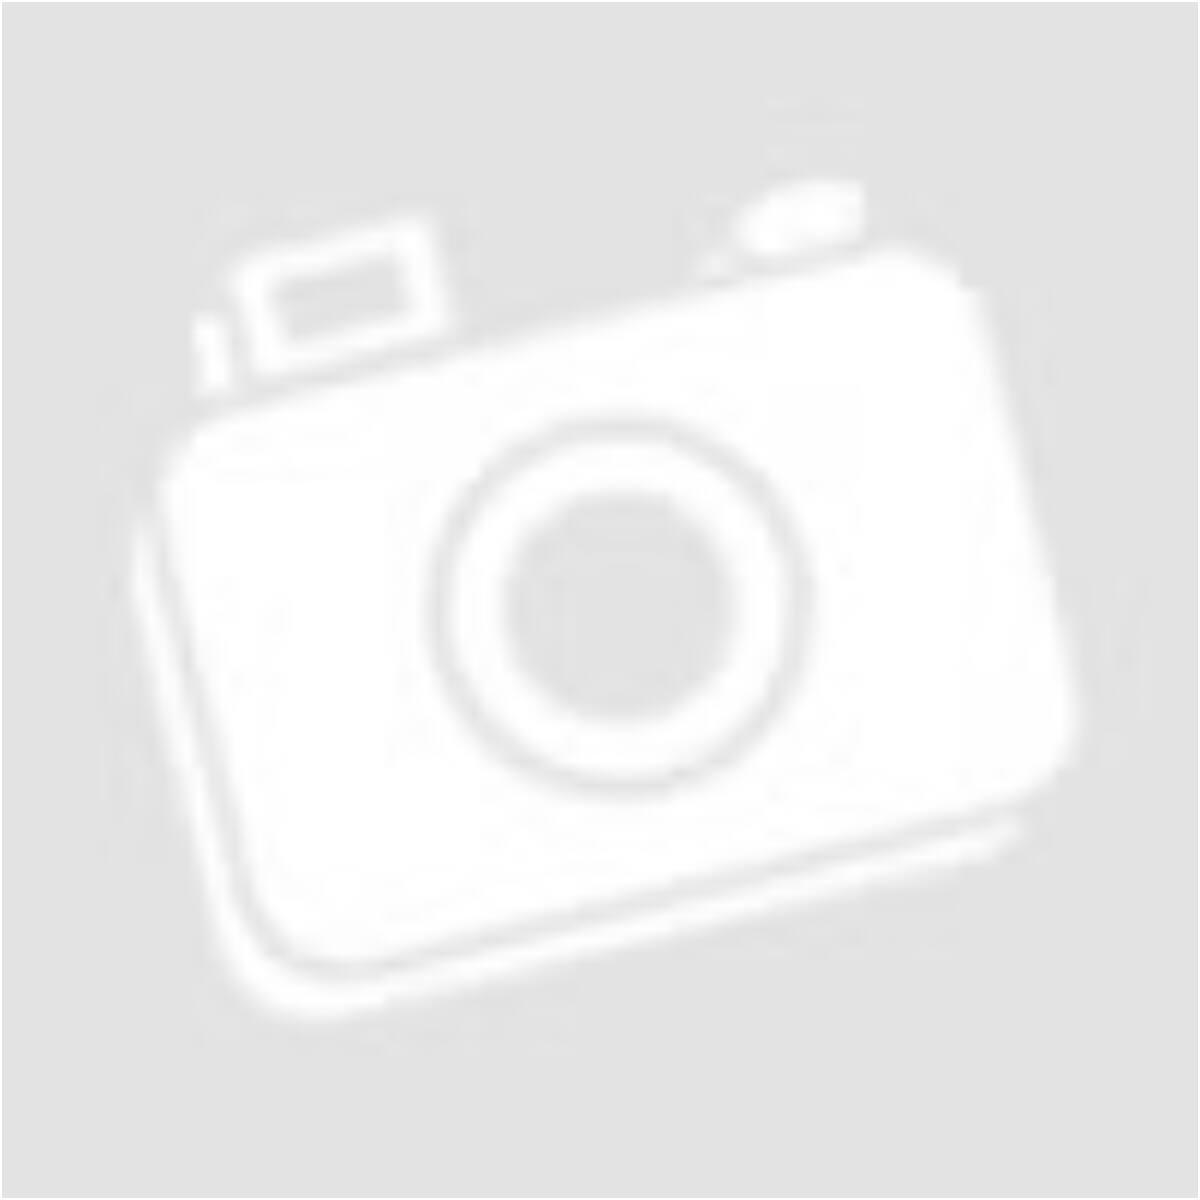 Új Gabriella Garay kabát M - Női télikabátok 5b4ff10d3c